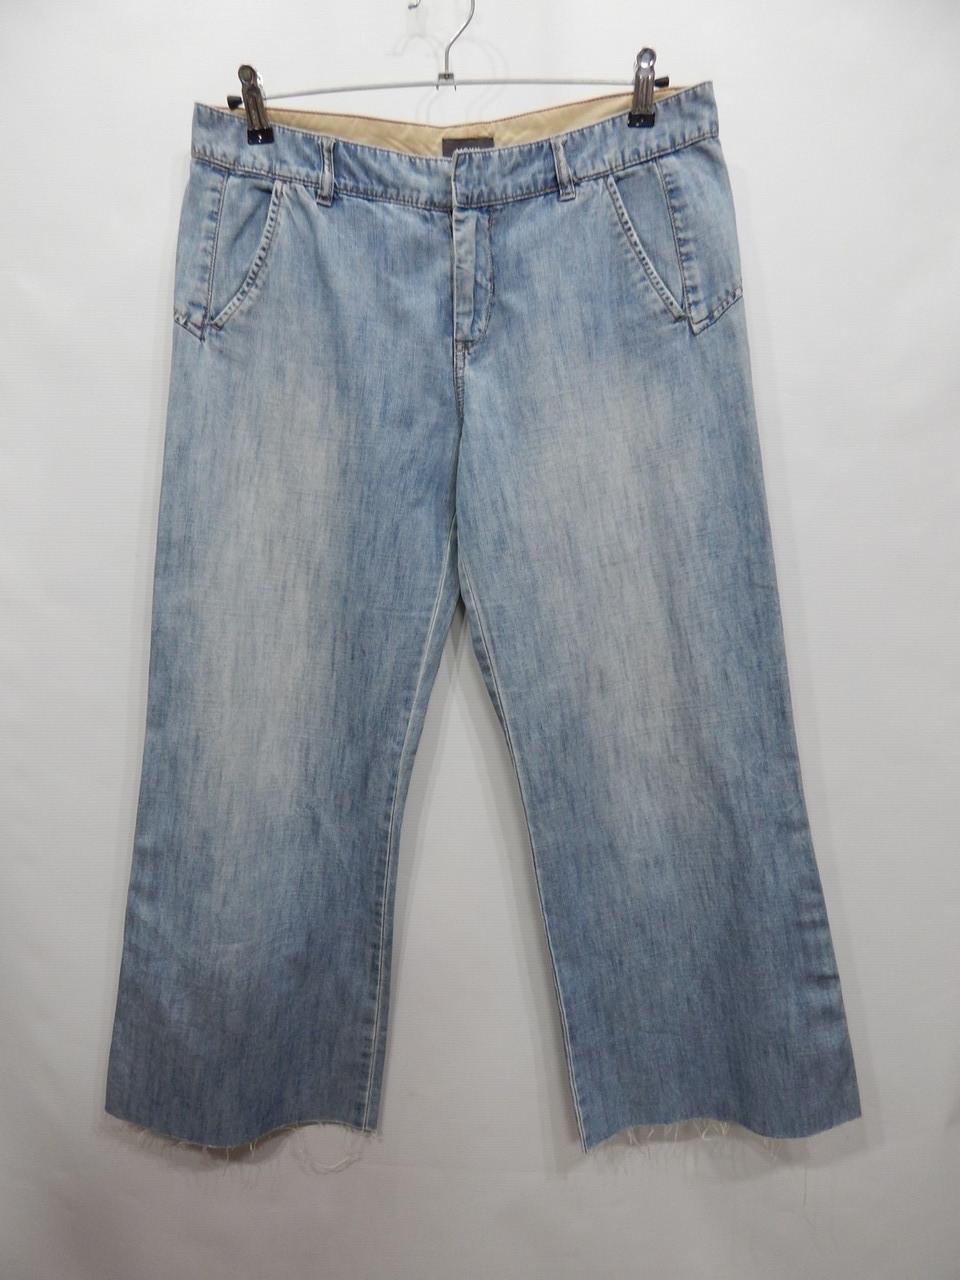 Бриджи женские cotton джинс MEXX р. 48-50 RUS,  194DGG